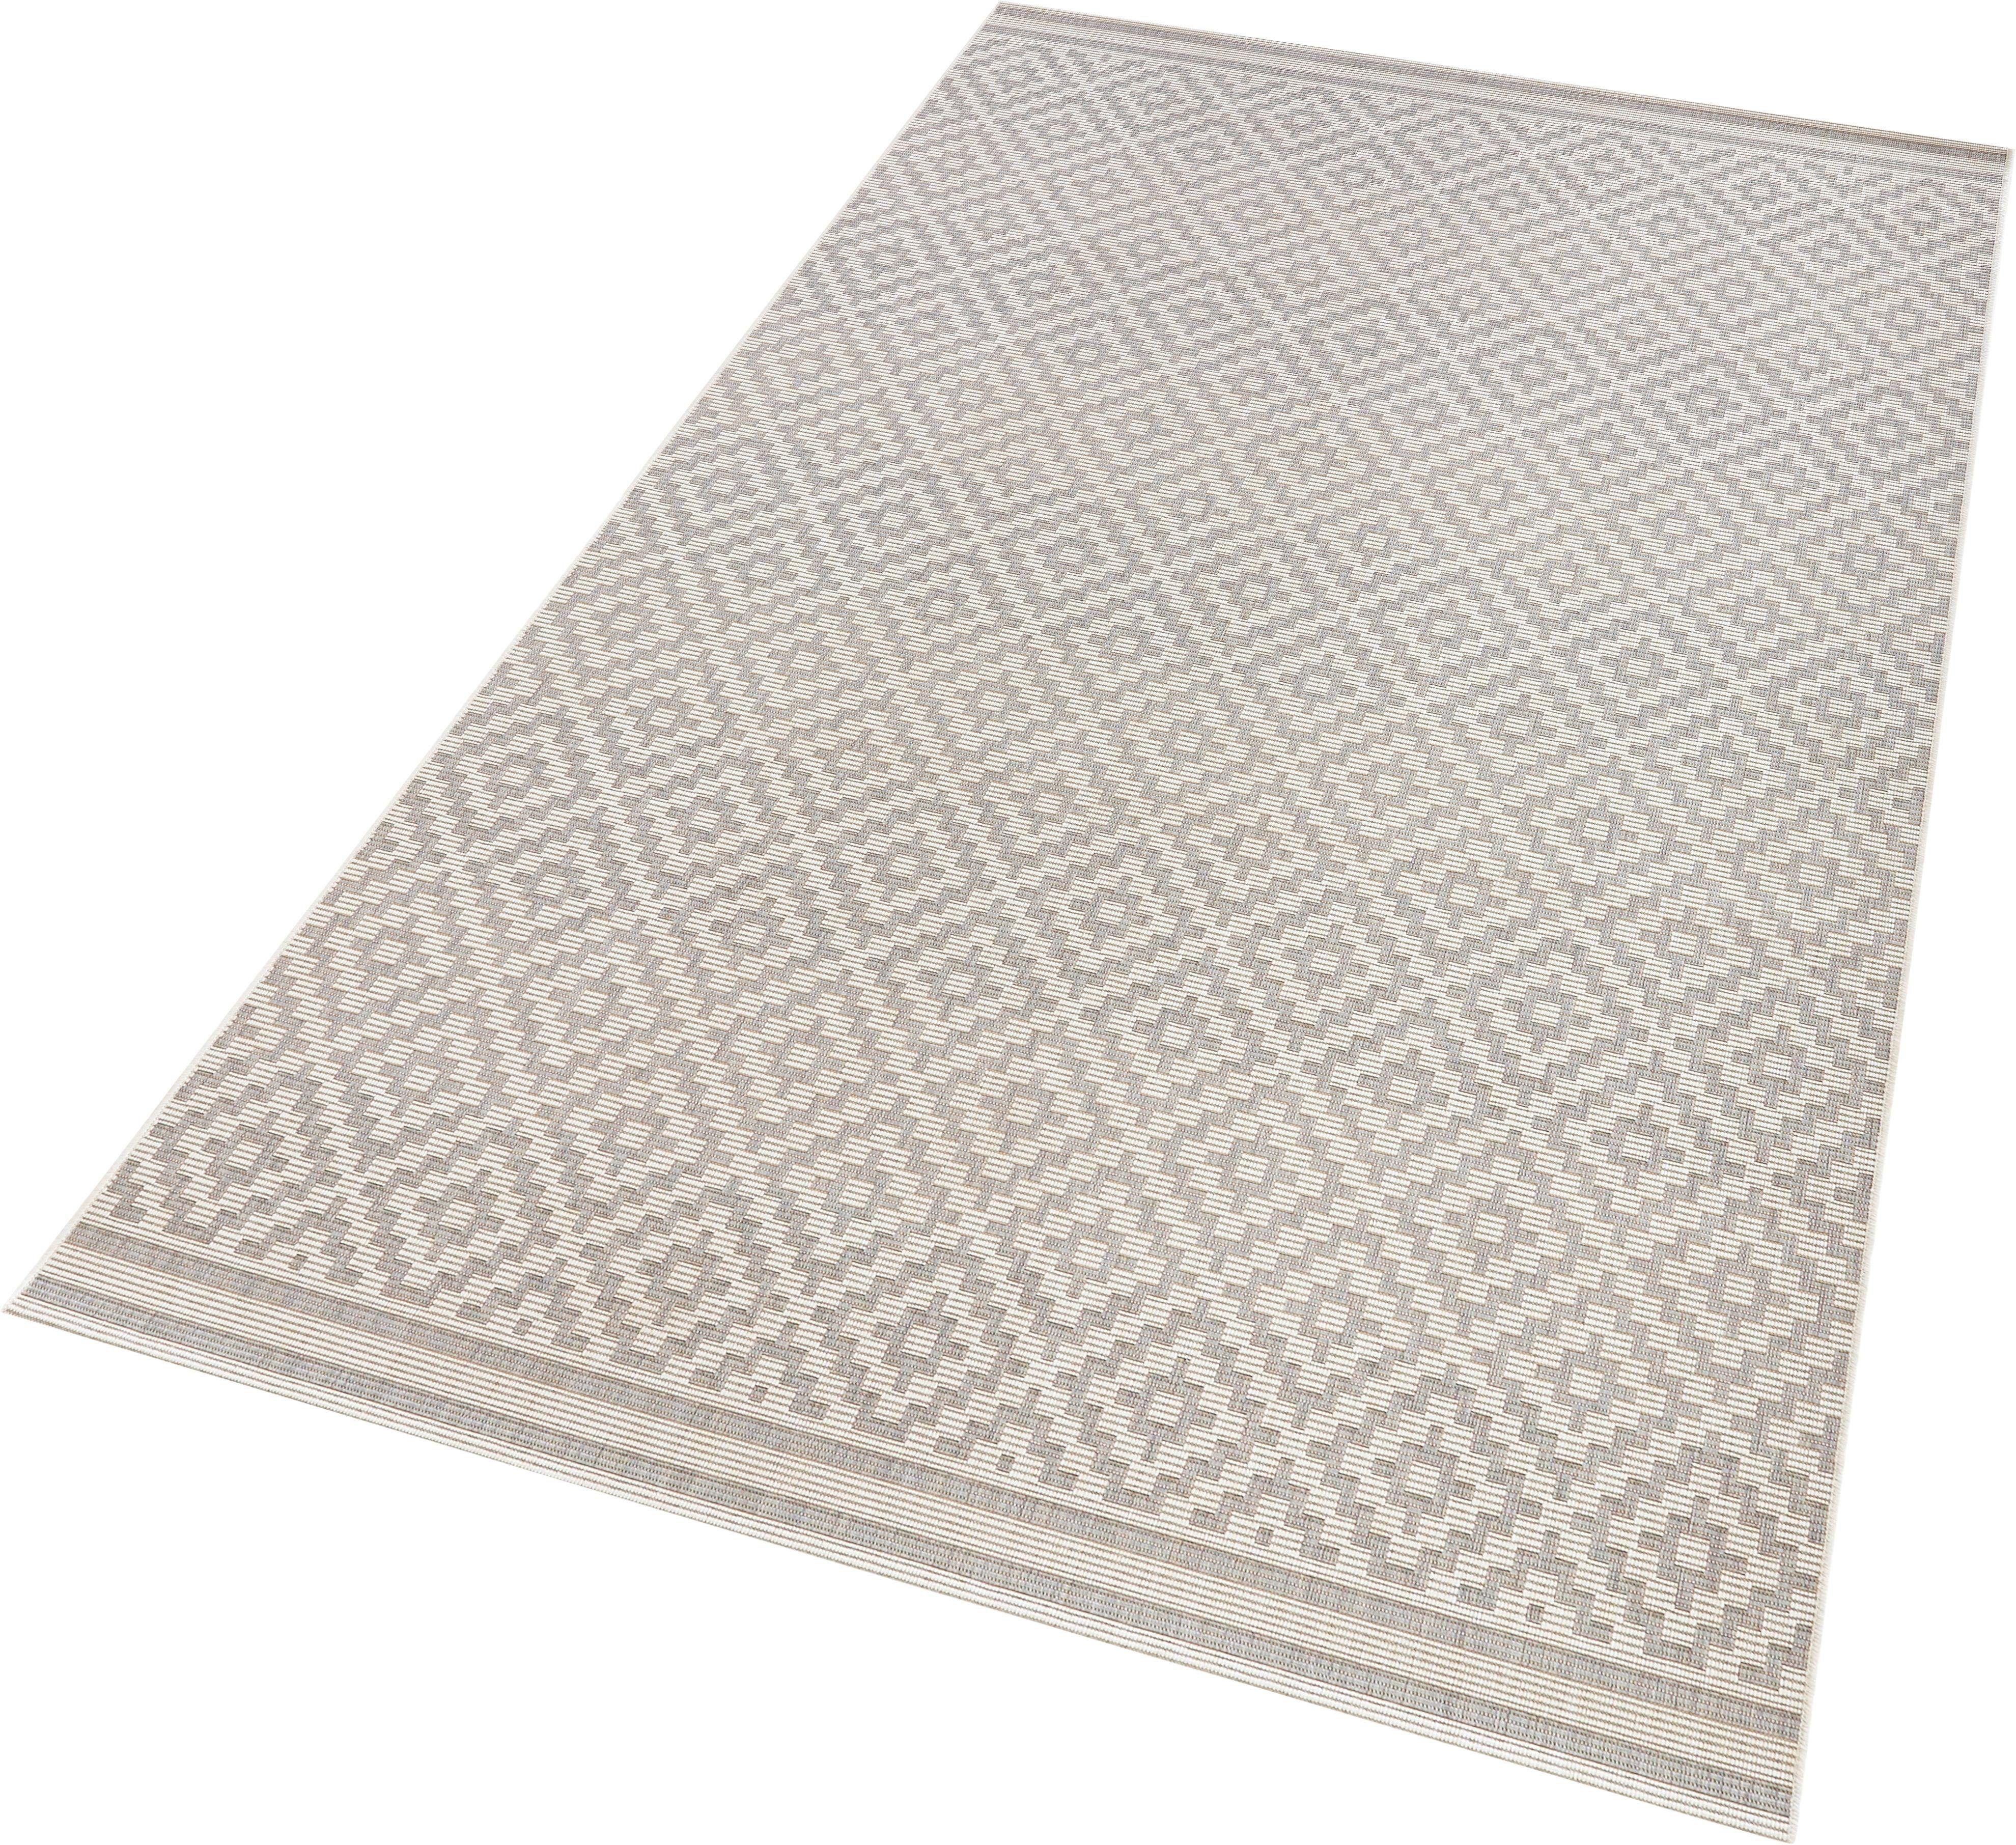 Bougari Teppich Grau B L 160x230cm 8mm Raute Fussbodenheizungsgeeignet Schmutzabweisend Jetzt Bestellen Unter Https Teppich Grau Teppich Teppich Ideen